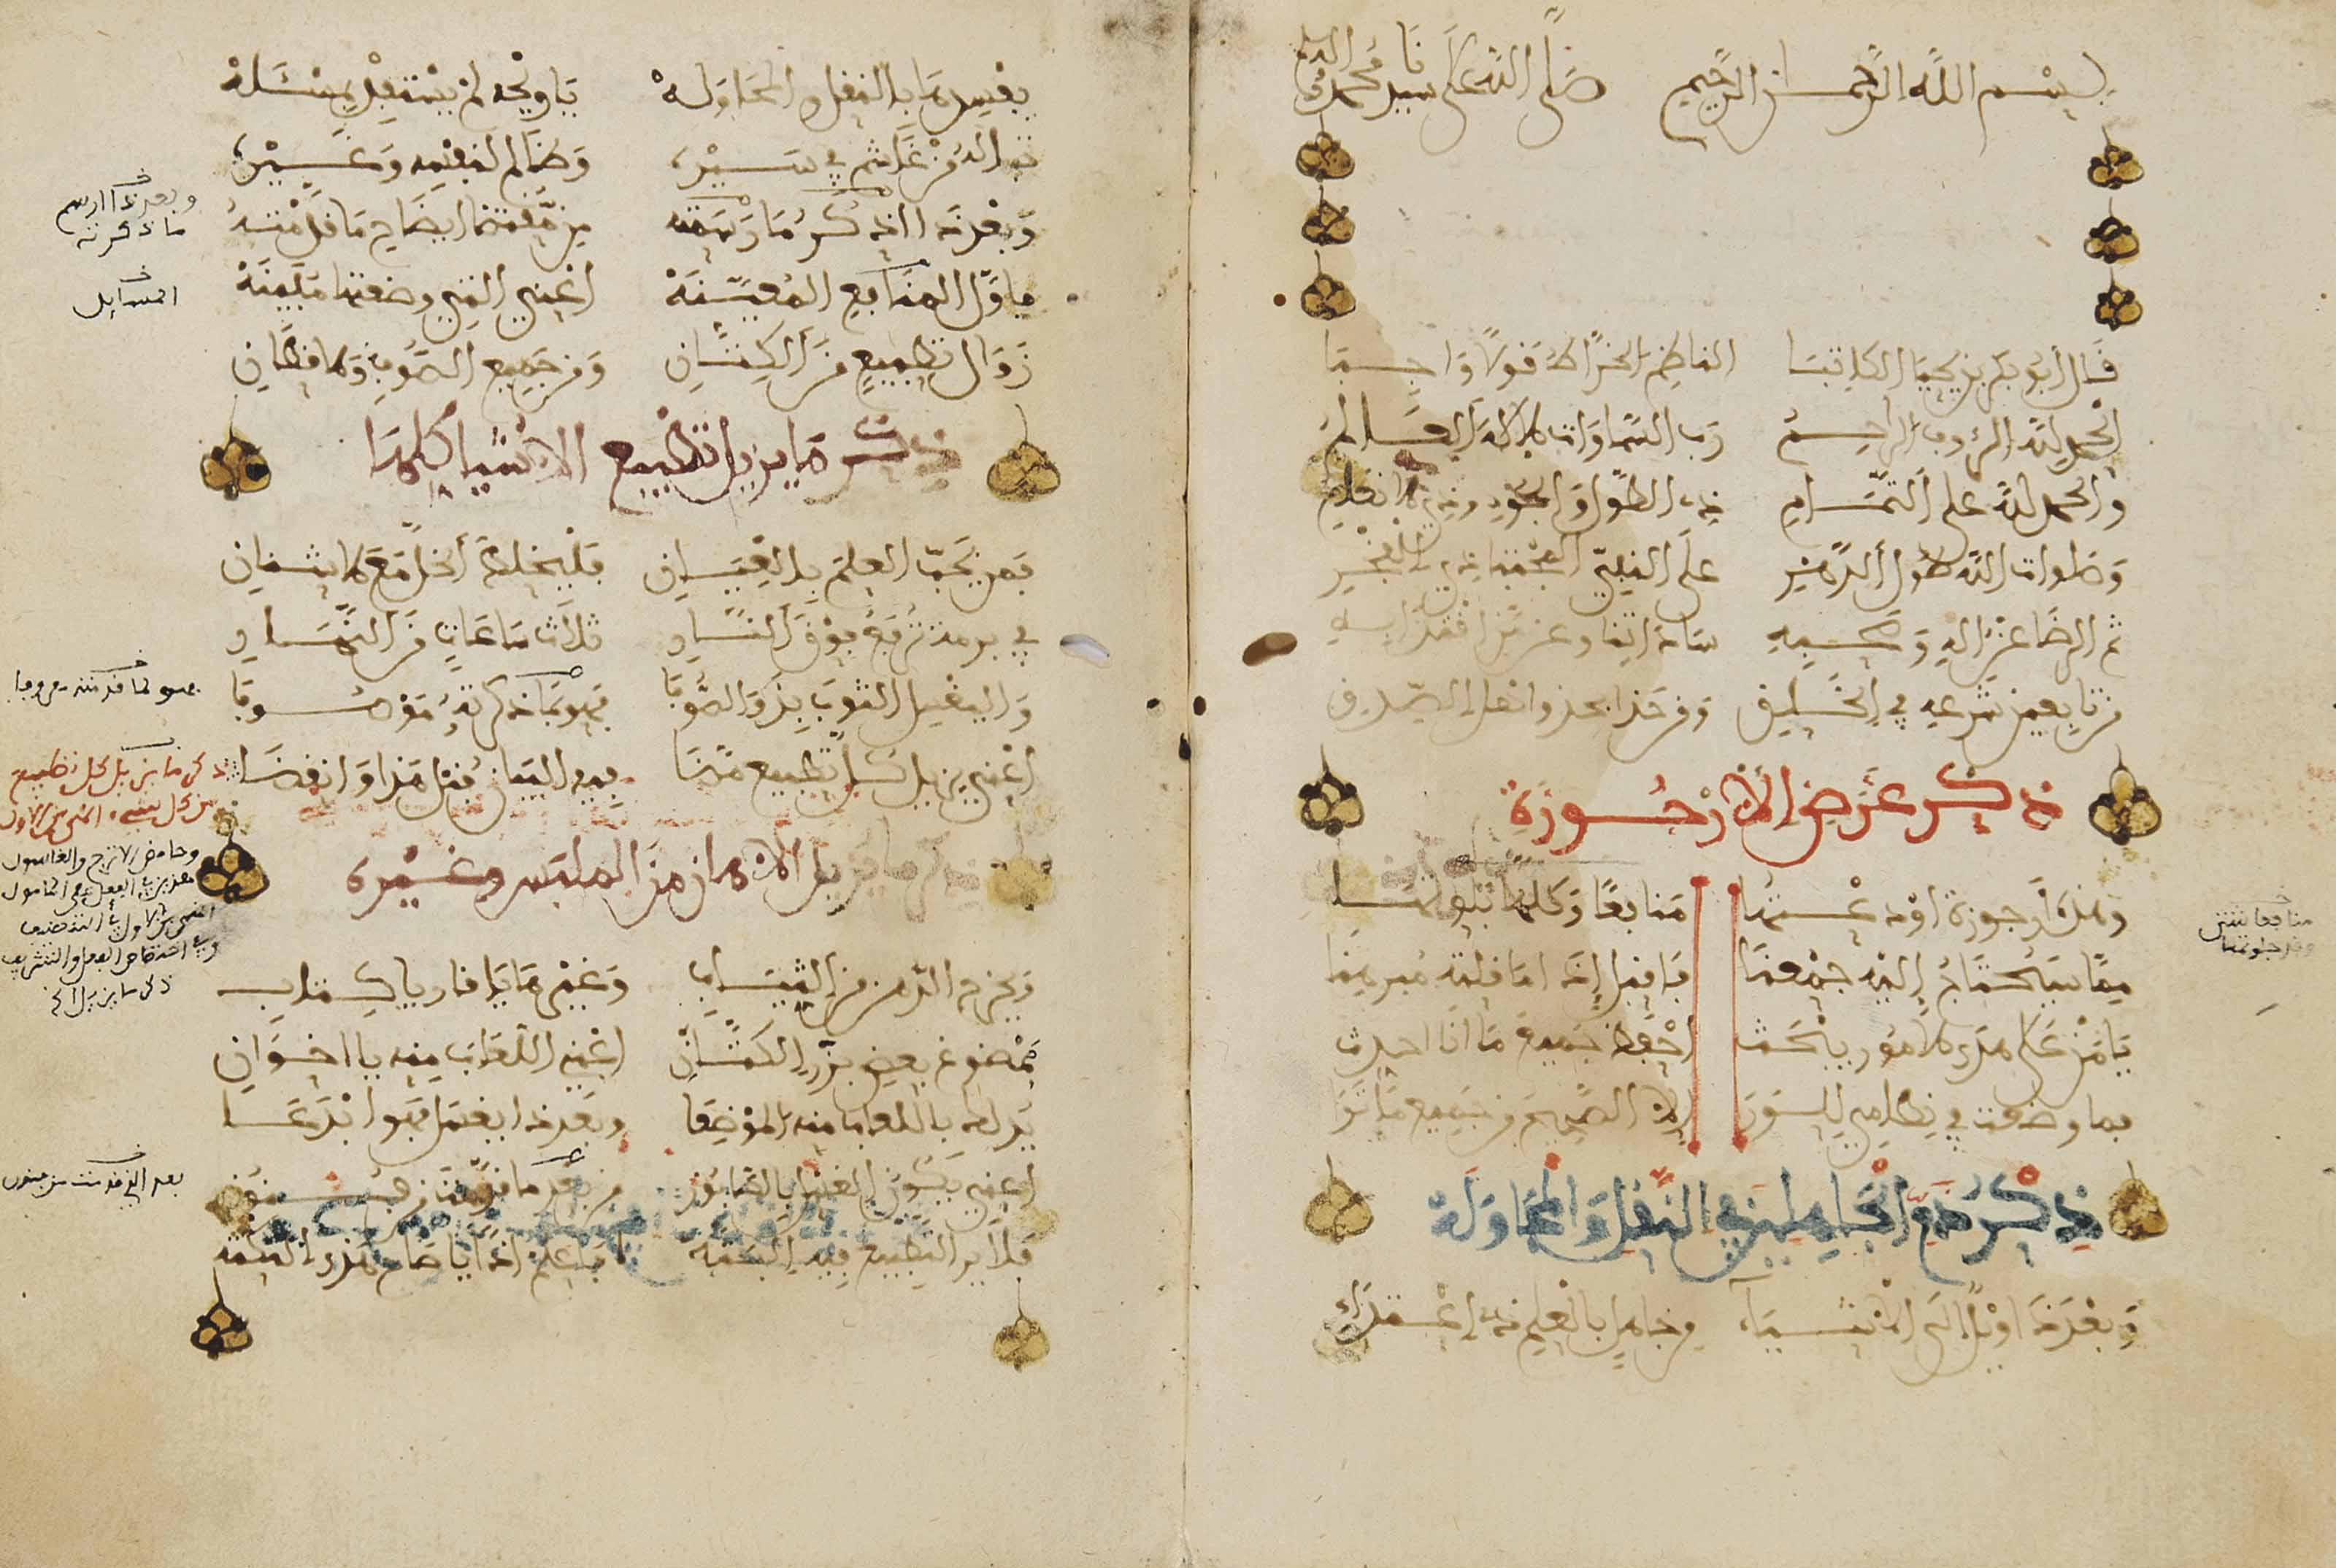 ABU BAKR BIN YAHYA AL-KHARRAT: